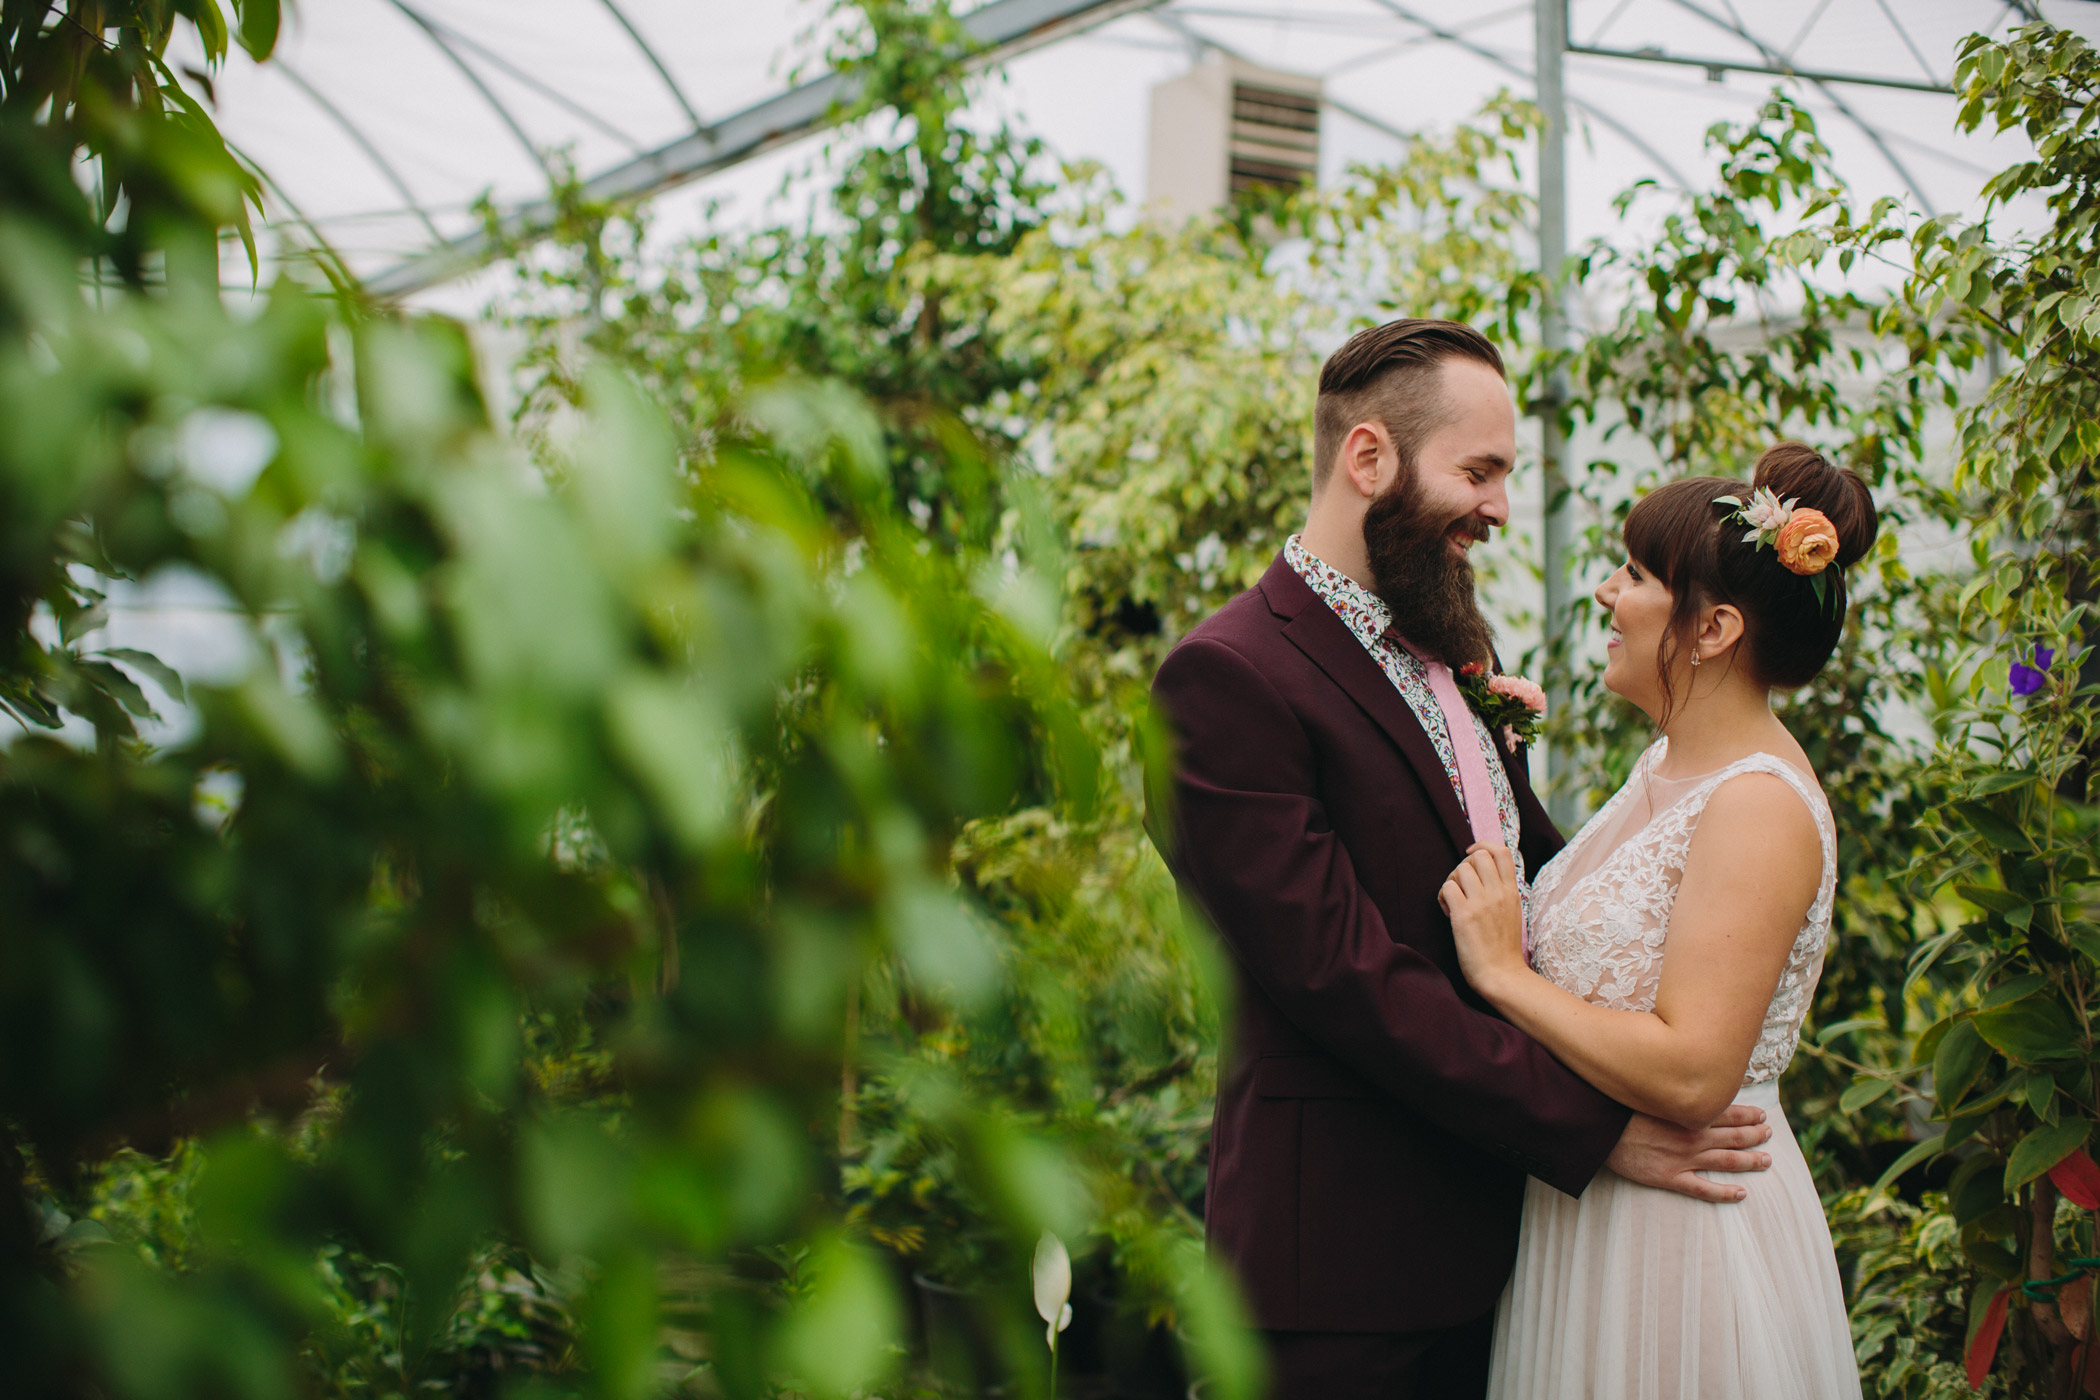 Wedding Portraits at Woodbridge Ponds